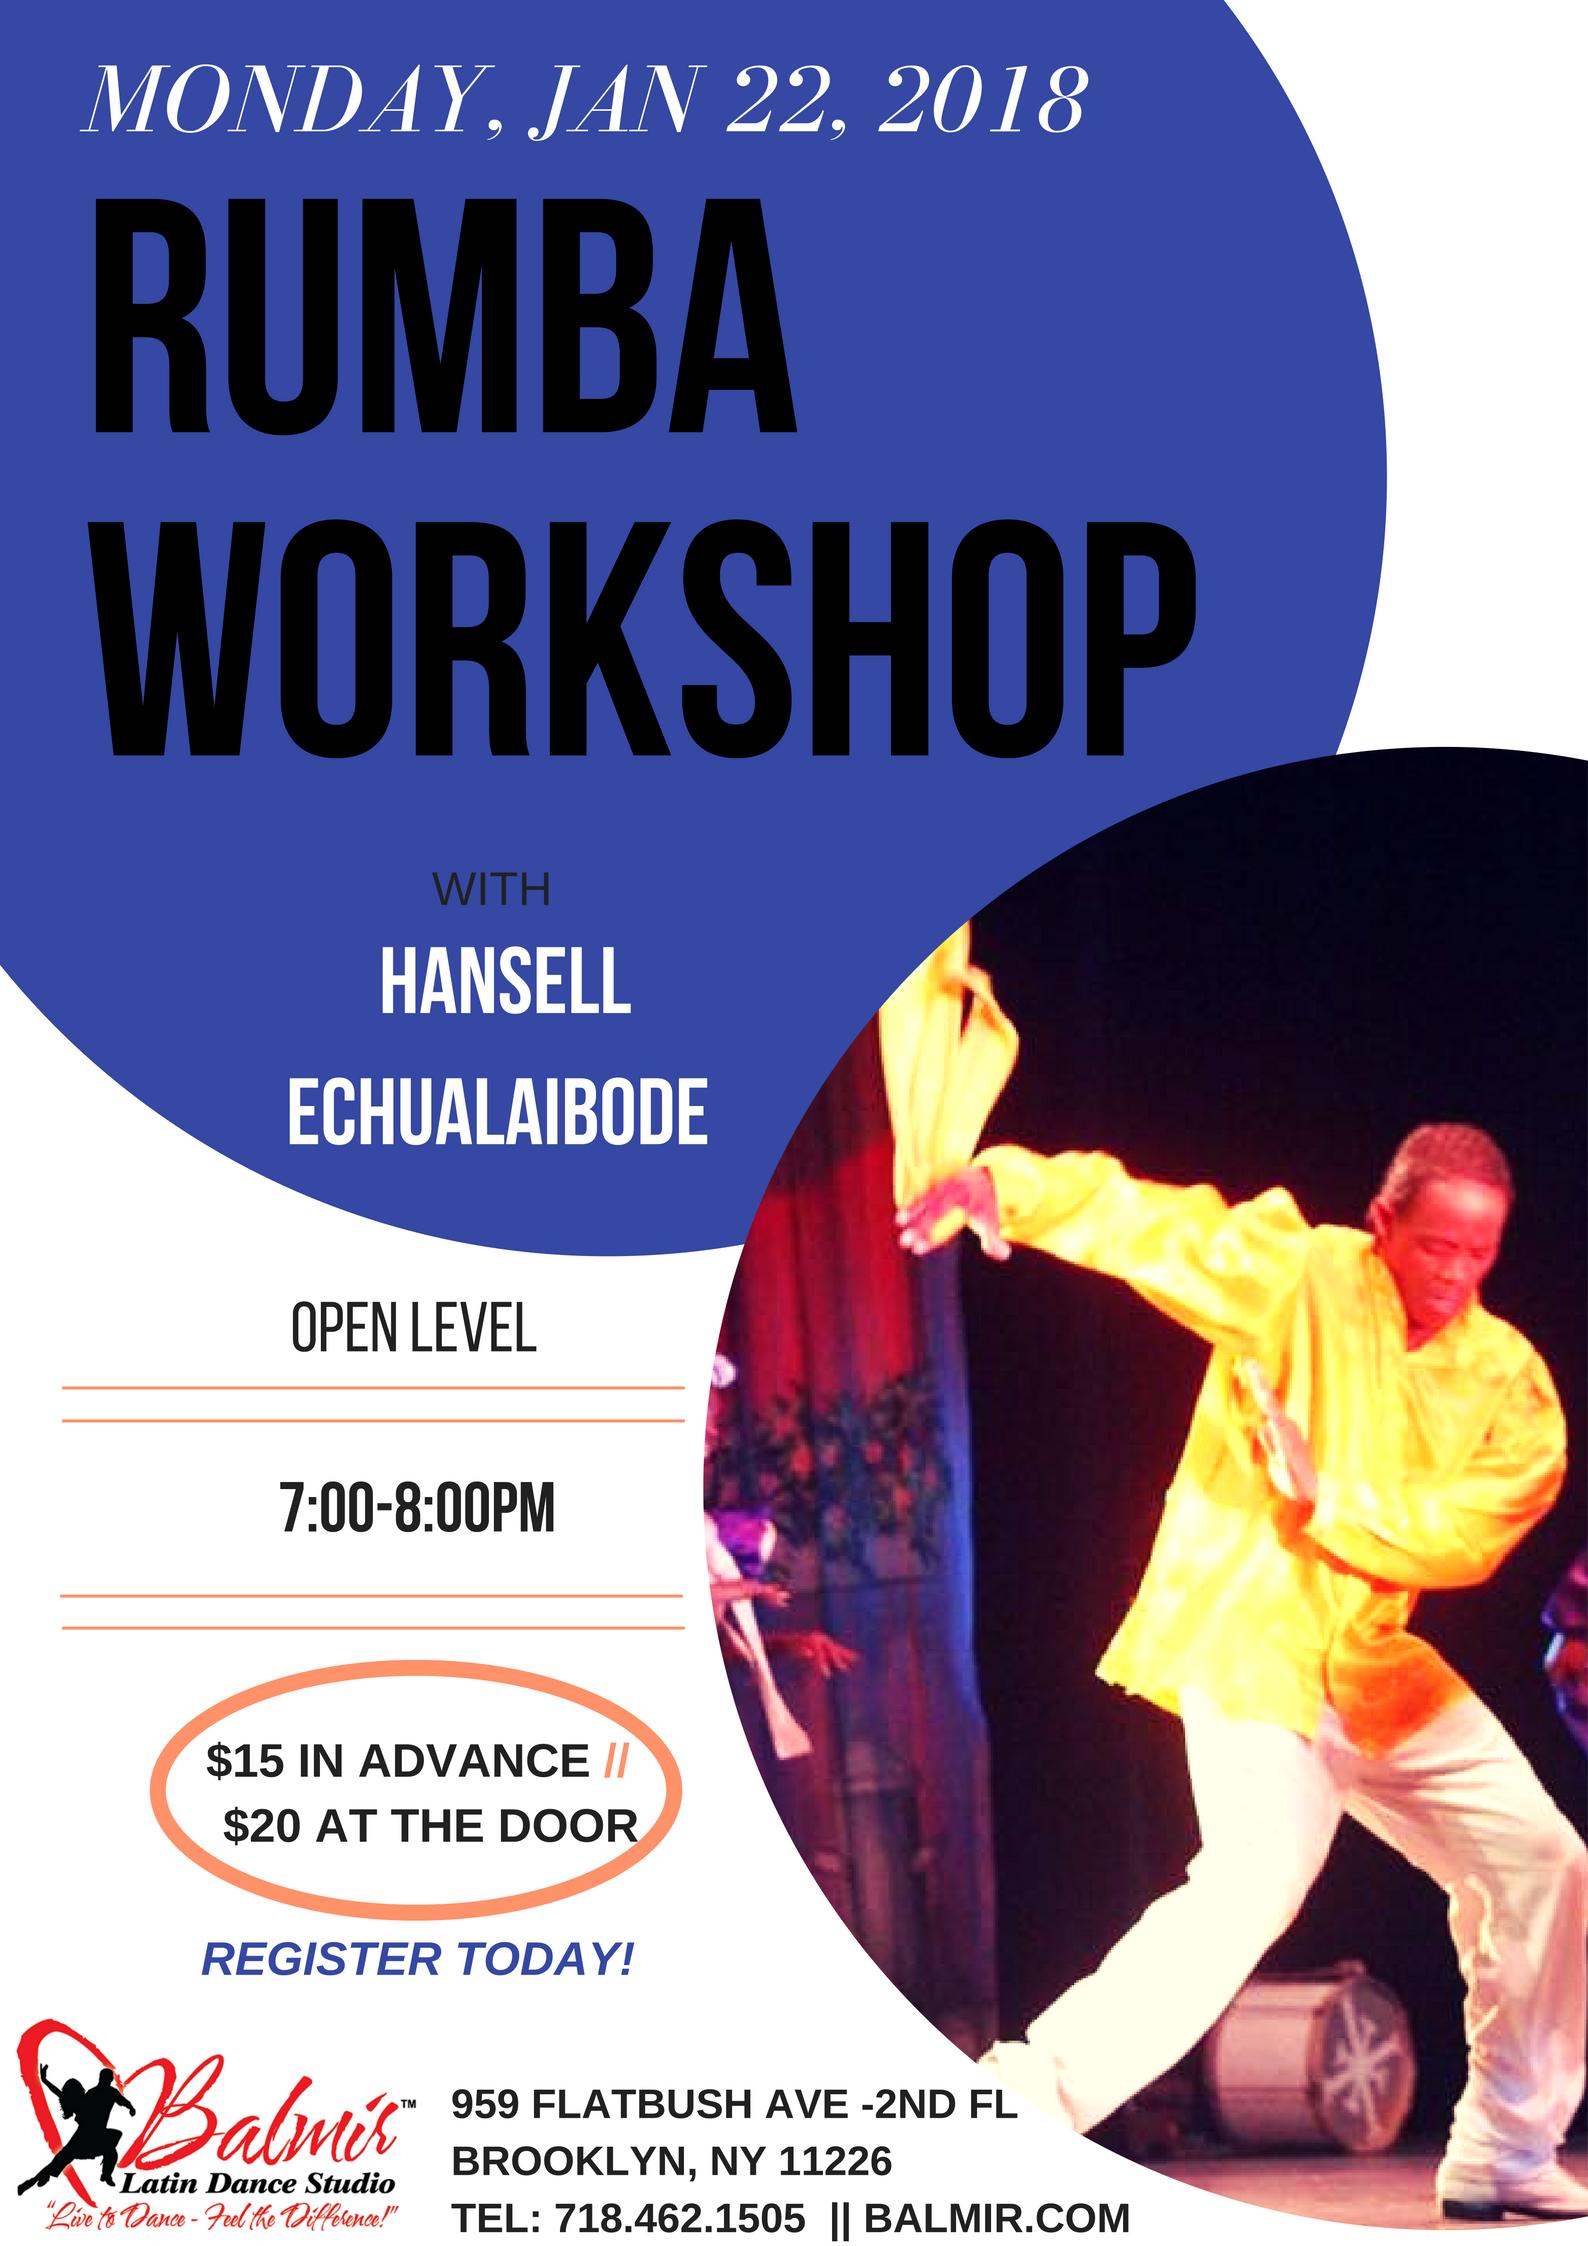 MONDAY, JAN 22, 2018 RUMBA WORKSHOP BALMIR LATIN DANCE STUDIO BROOKLYN NYC.png